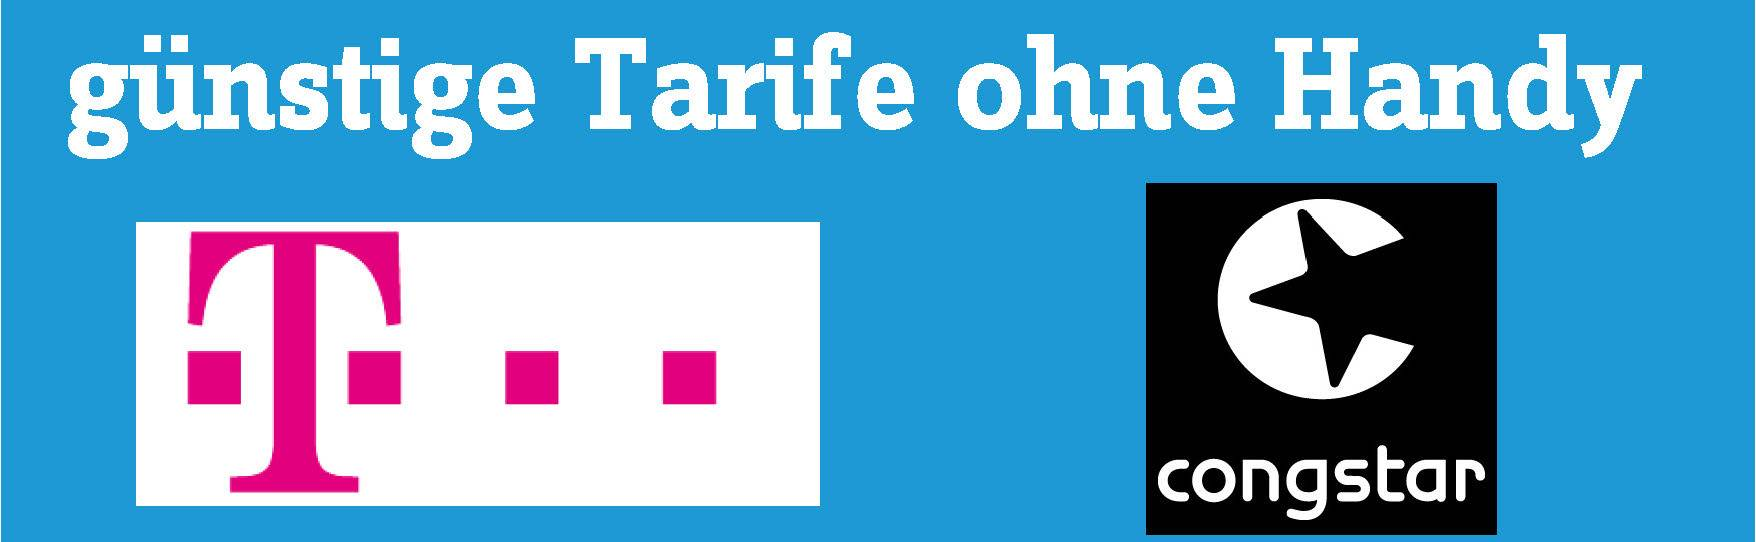 Tarife ohne Handy